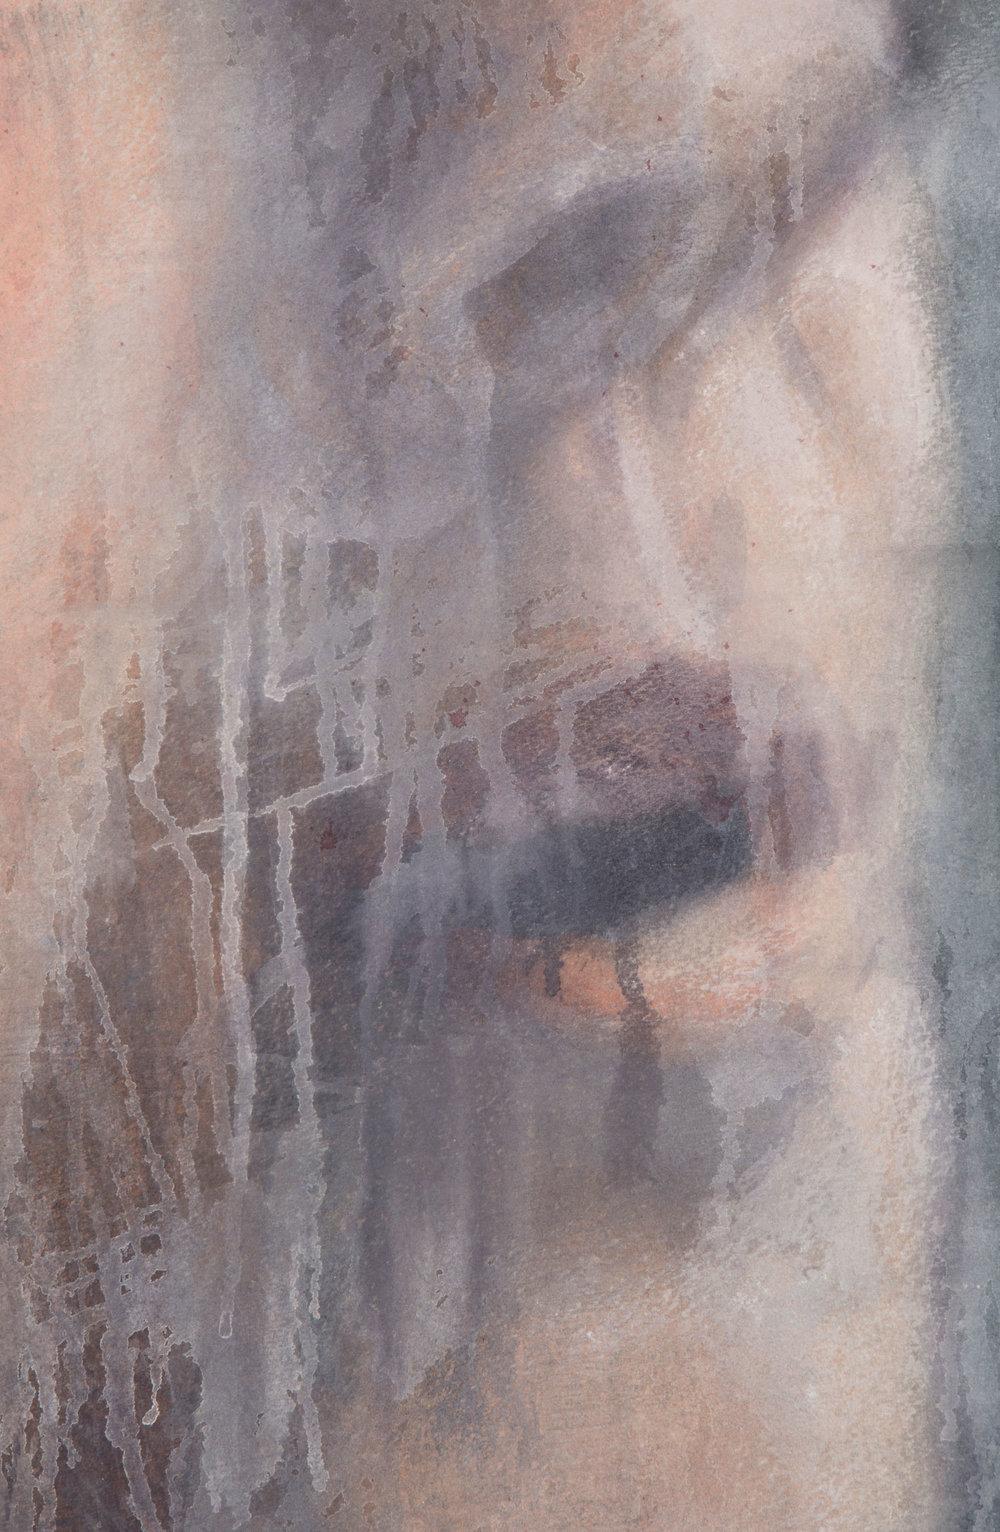 Self-portrait I - detail